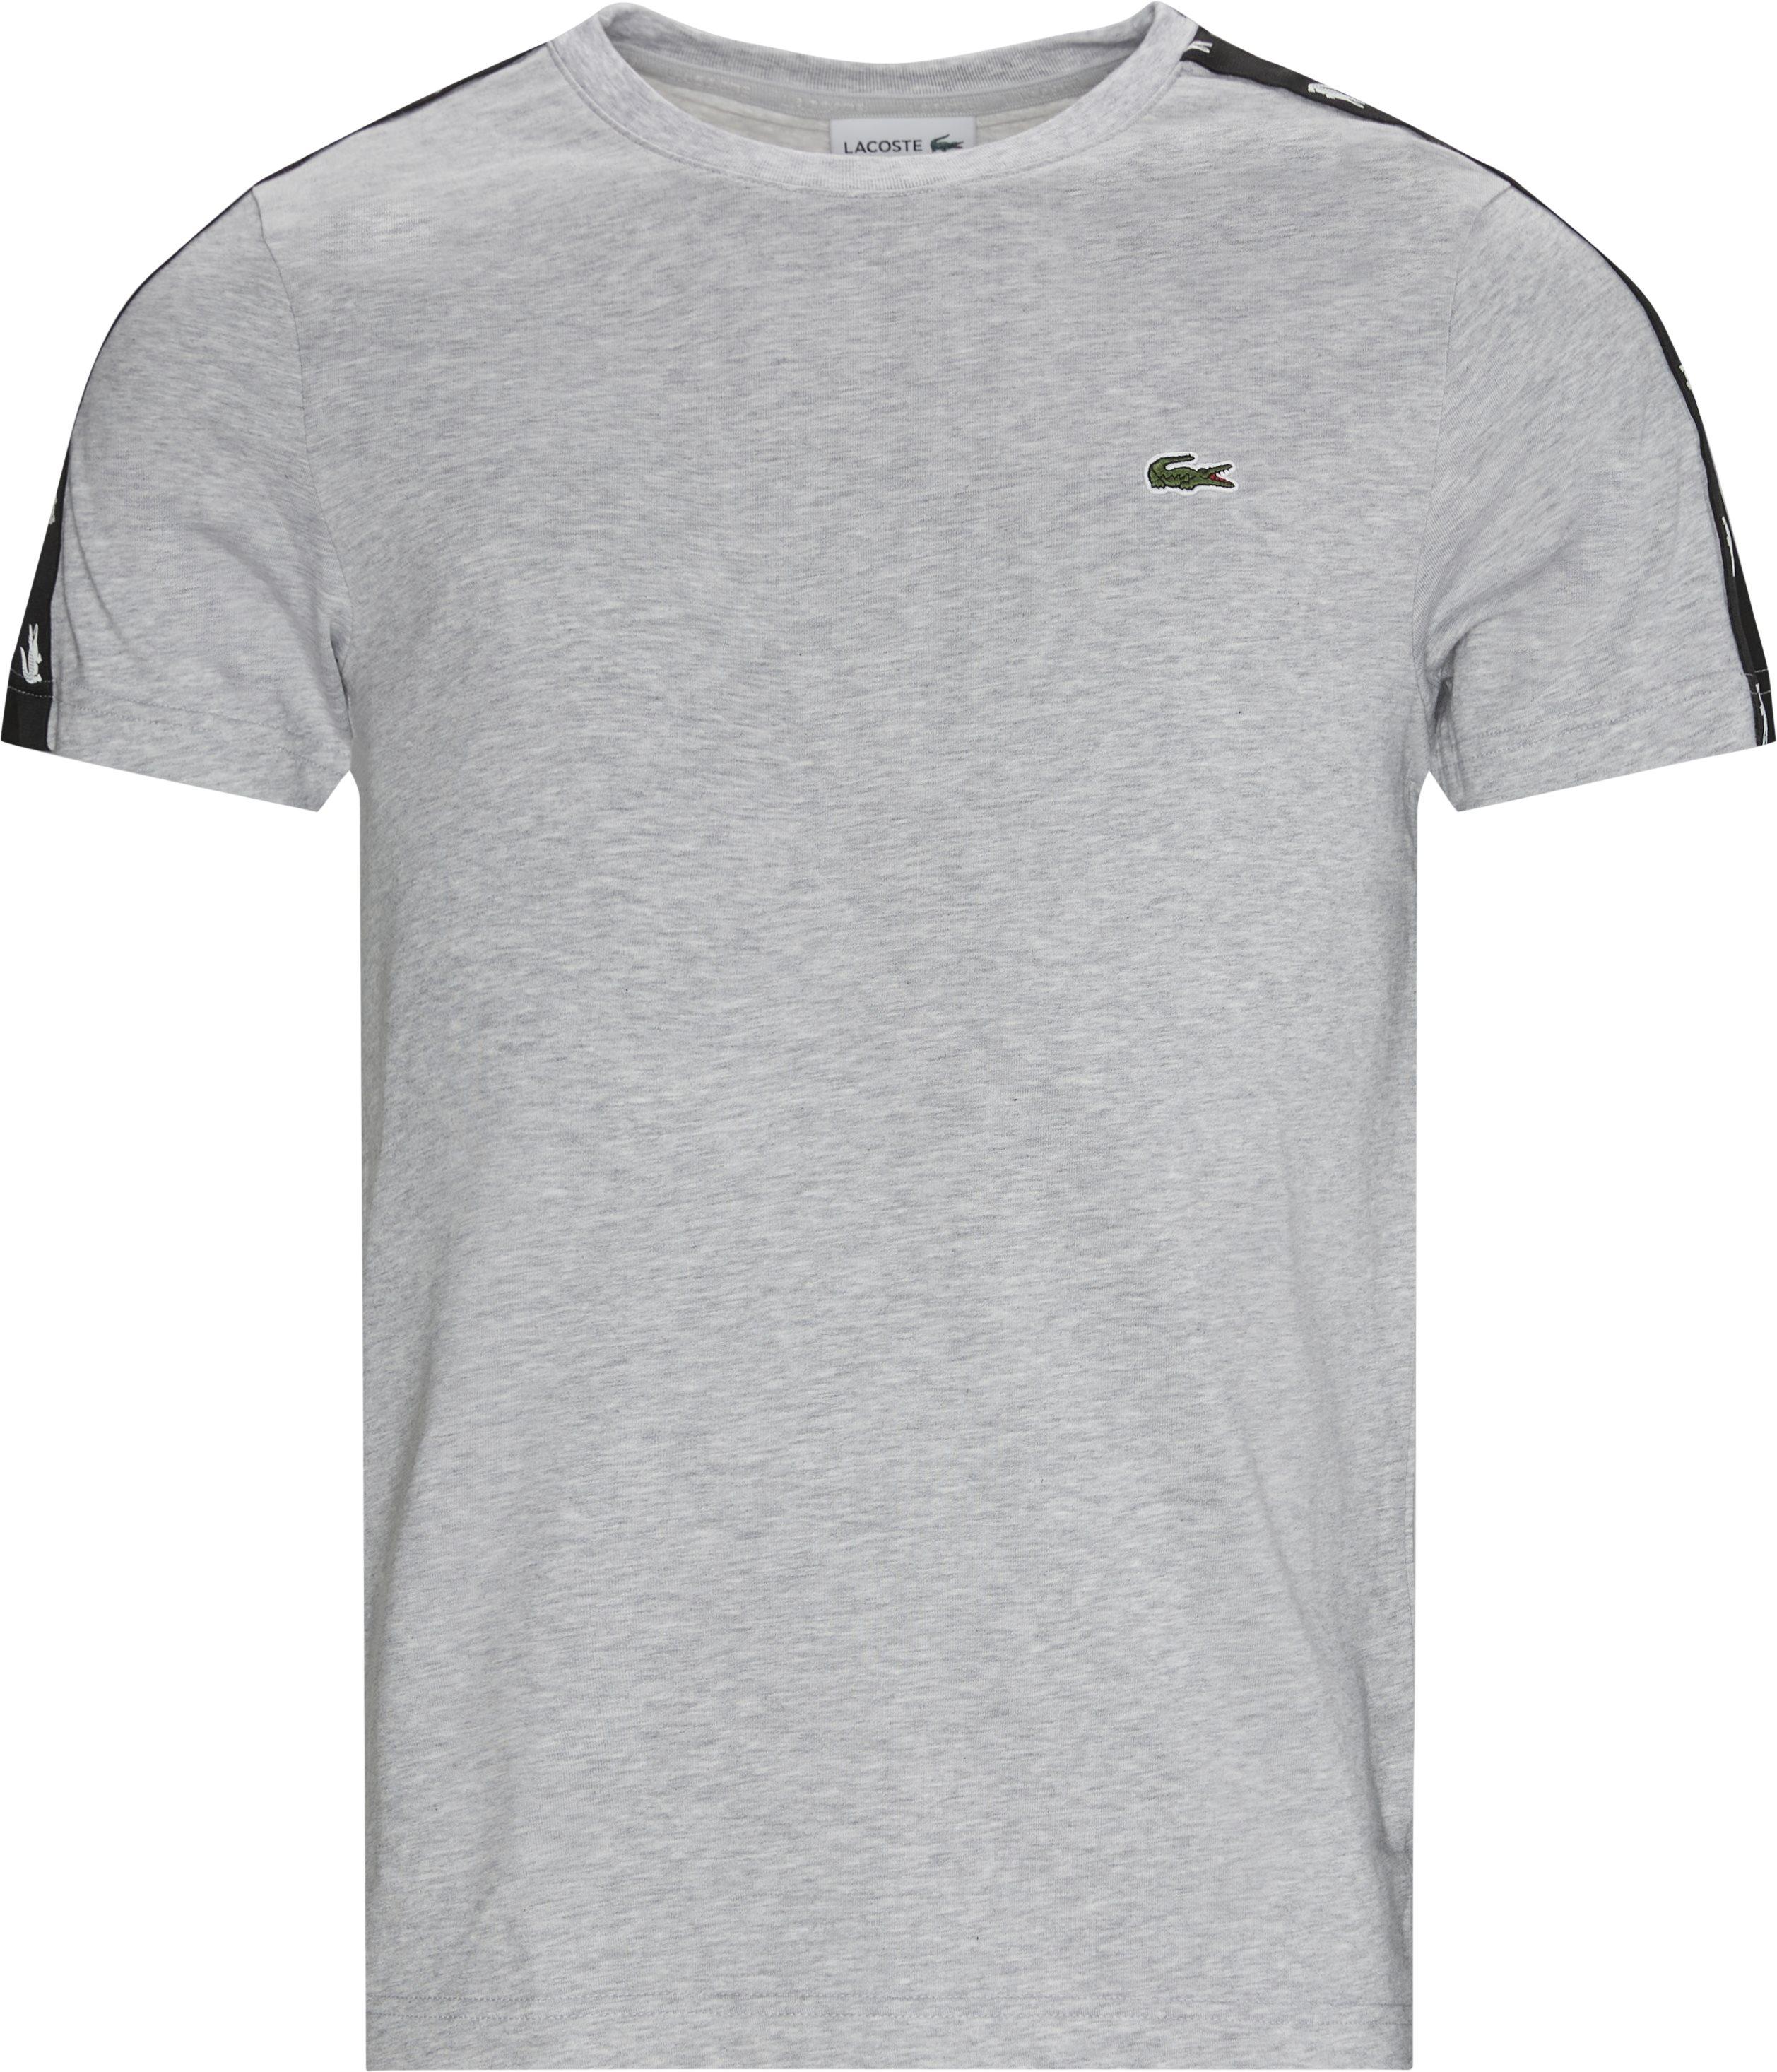 TH5172 T-shirt - T-shirts - Regular fit - Grå